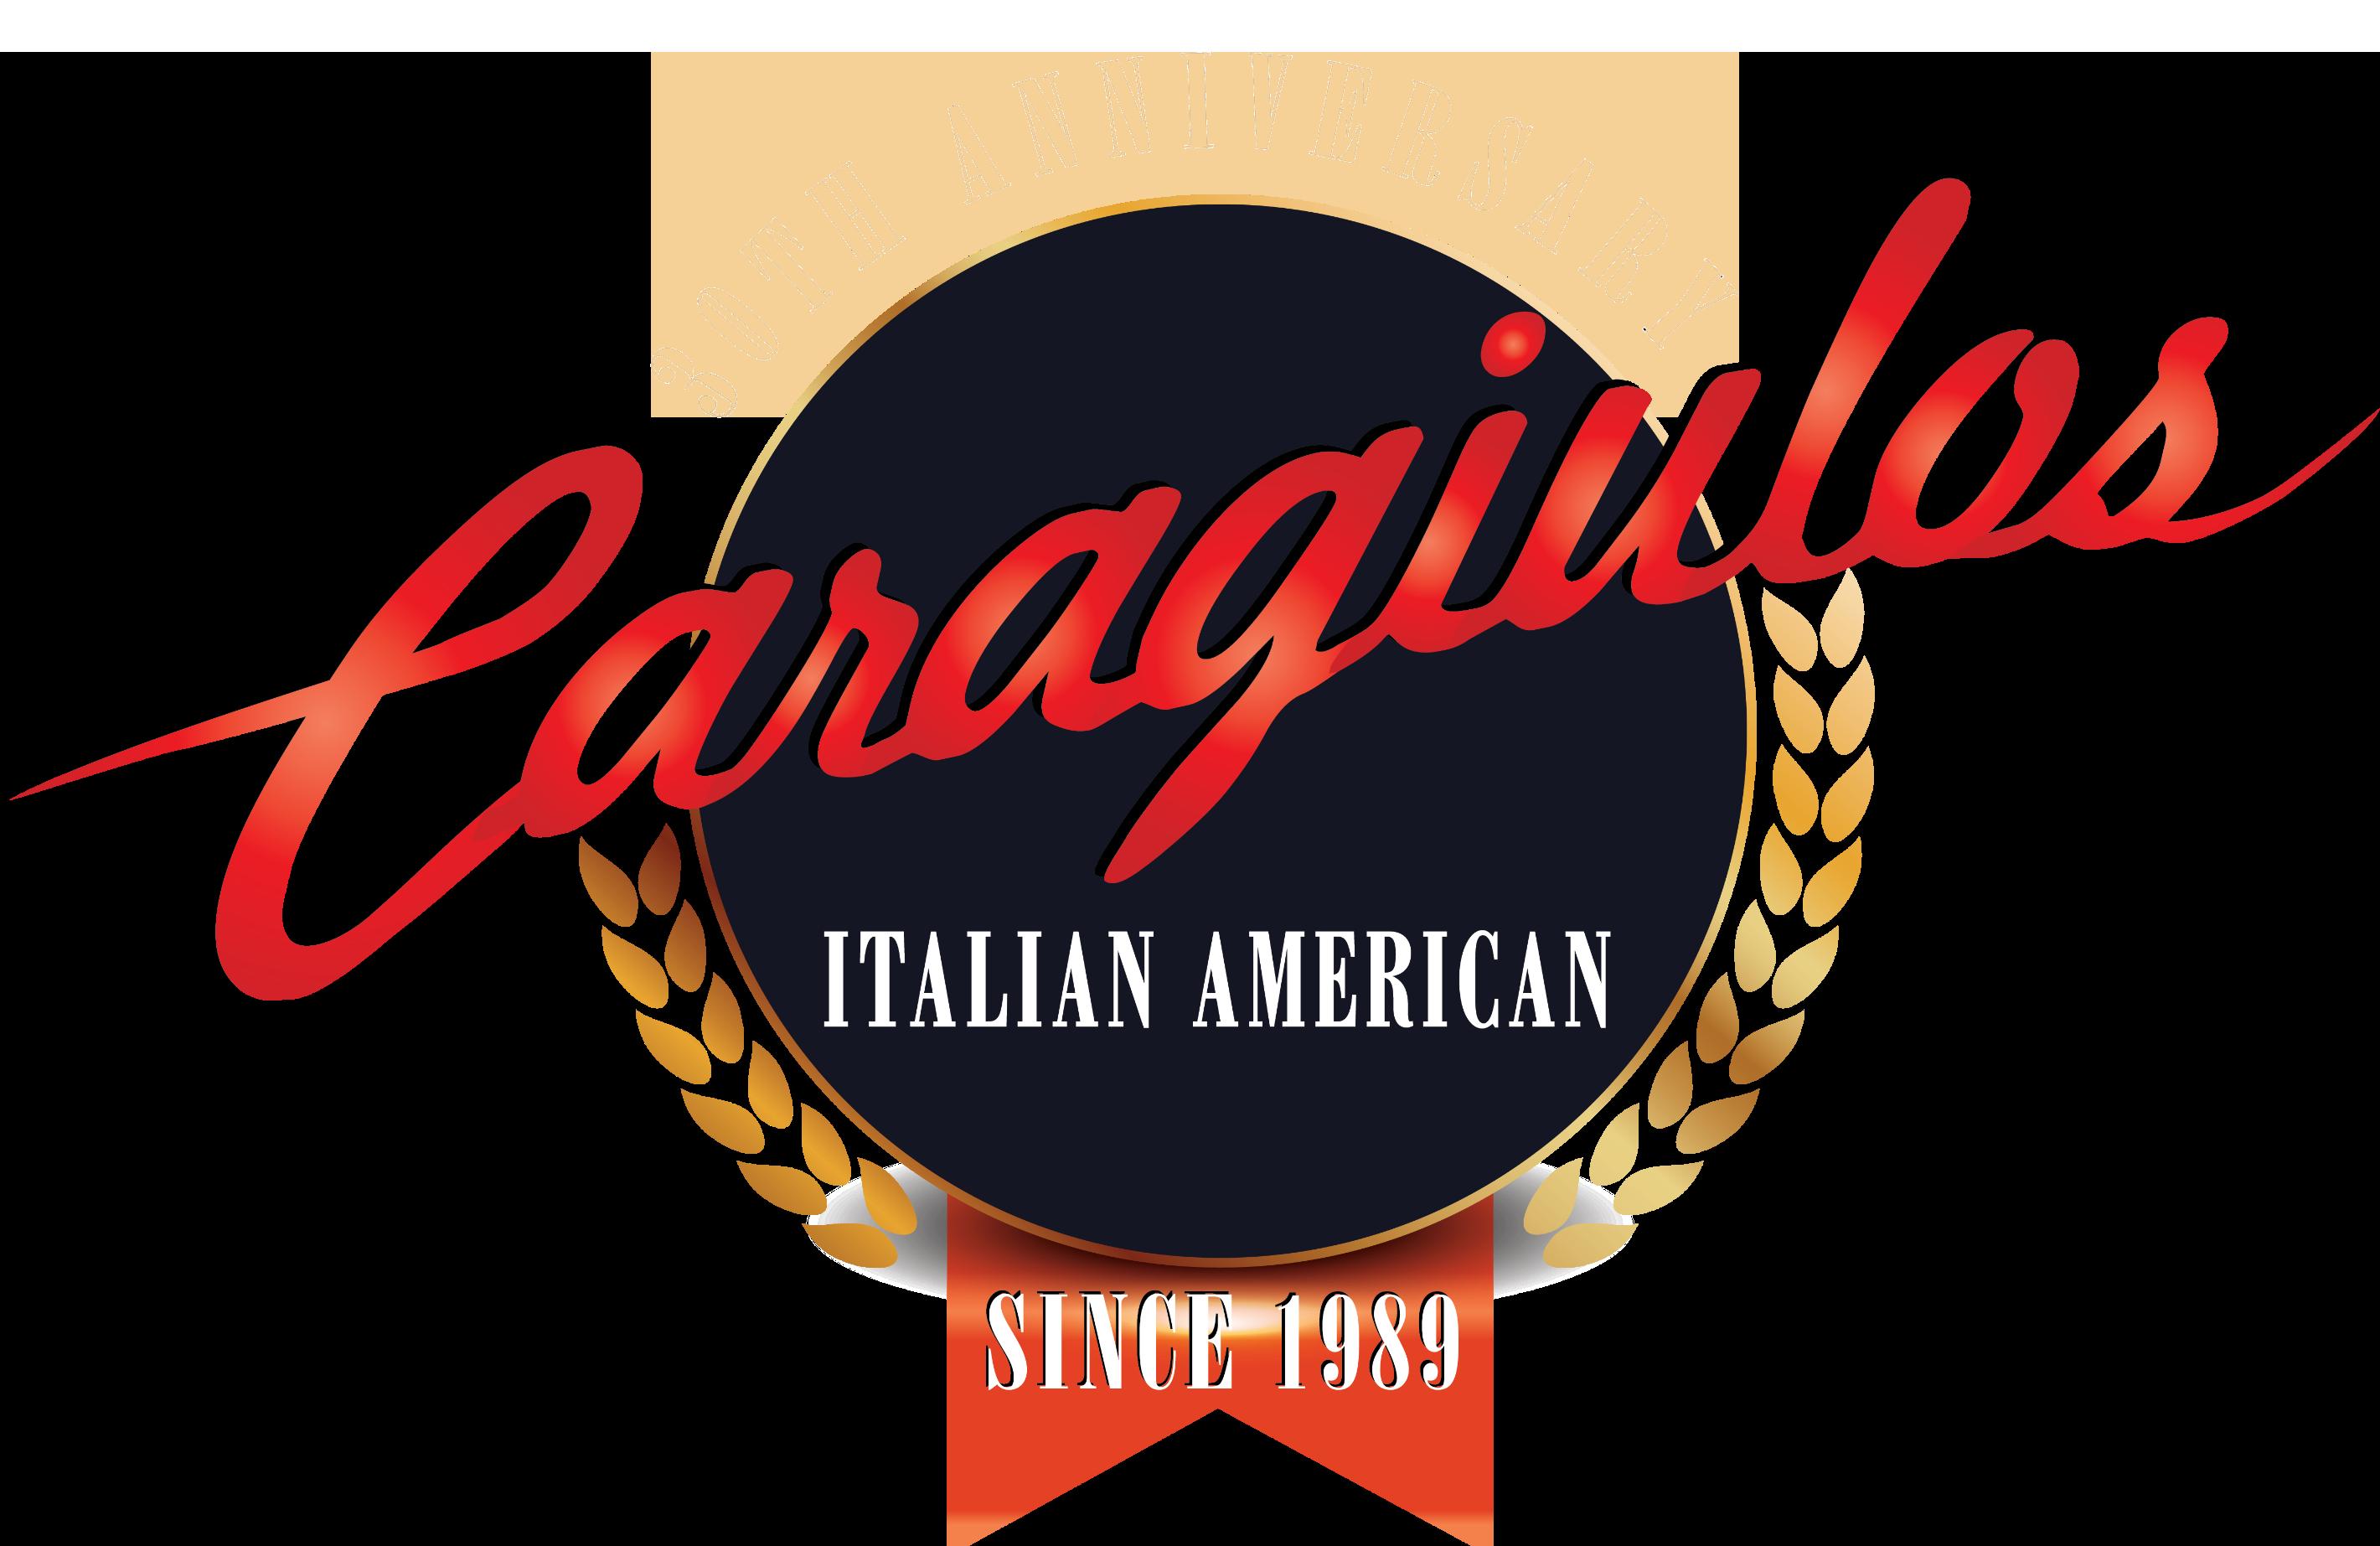 Caragiulos Italian American Restaurant - 69 South Palm Avenue, Sarasota Fl